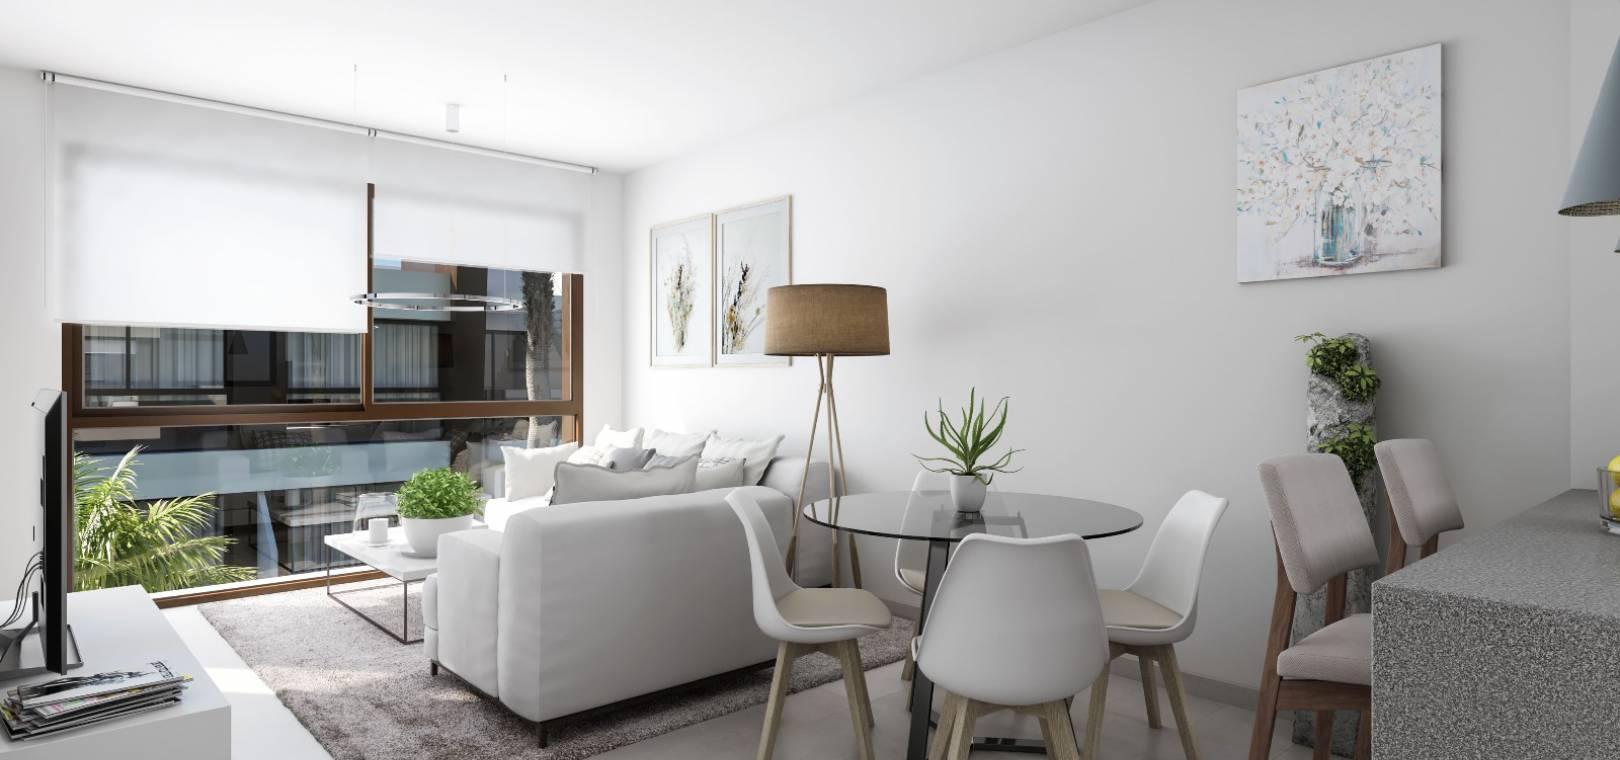 New Build - Apartment - San Pedro del Pinatar - Res. Belich